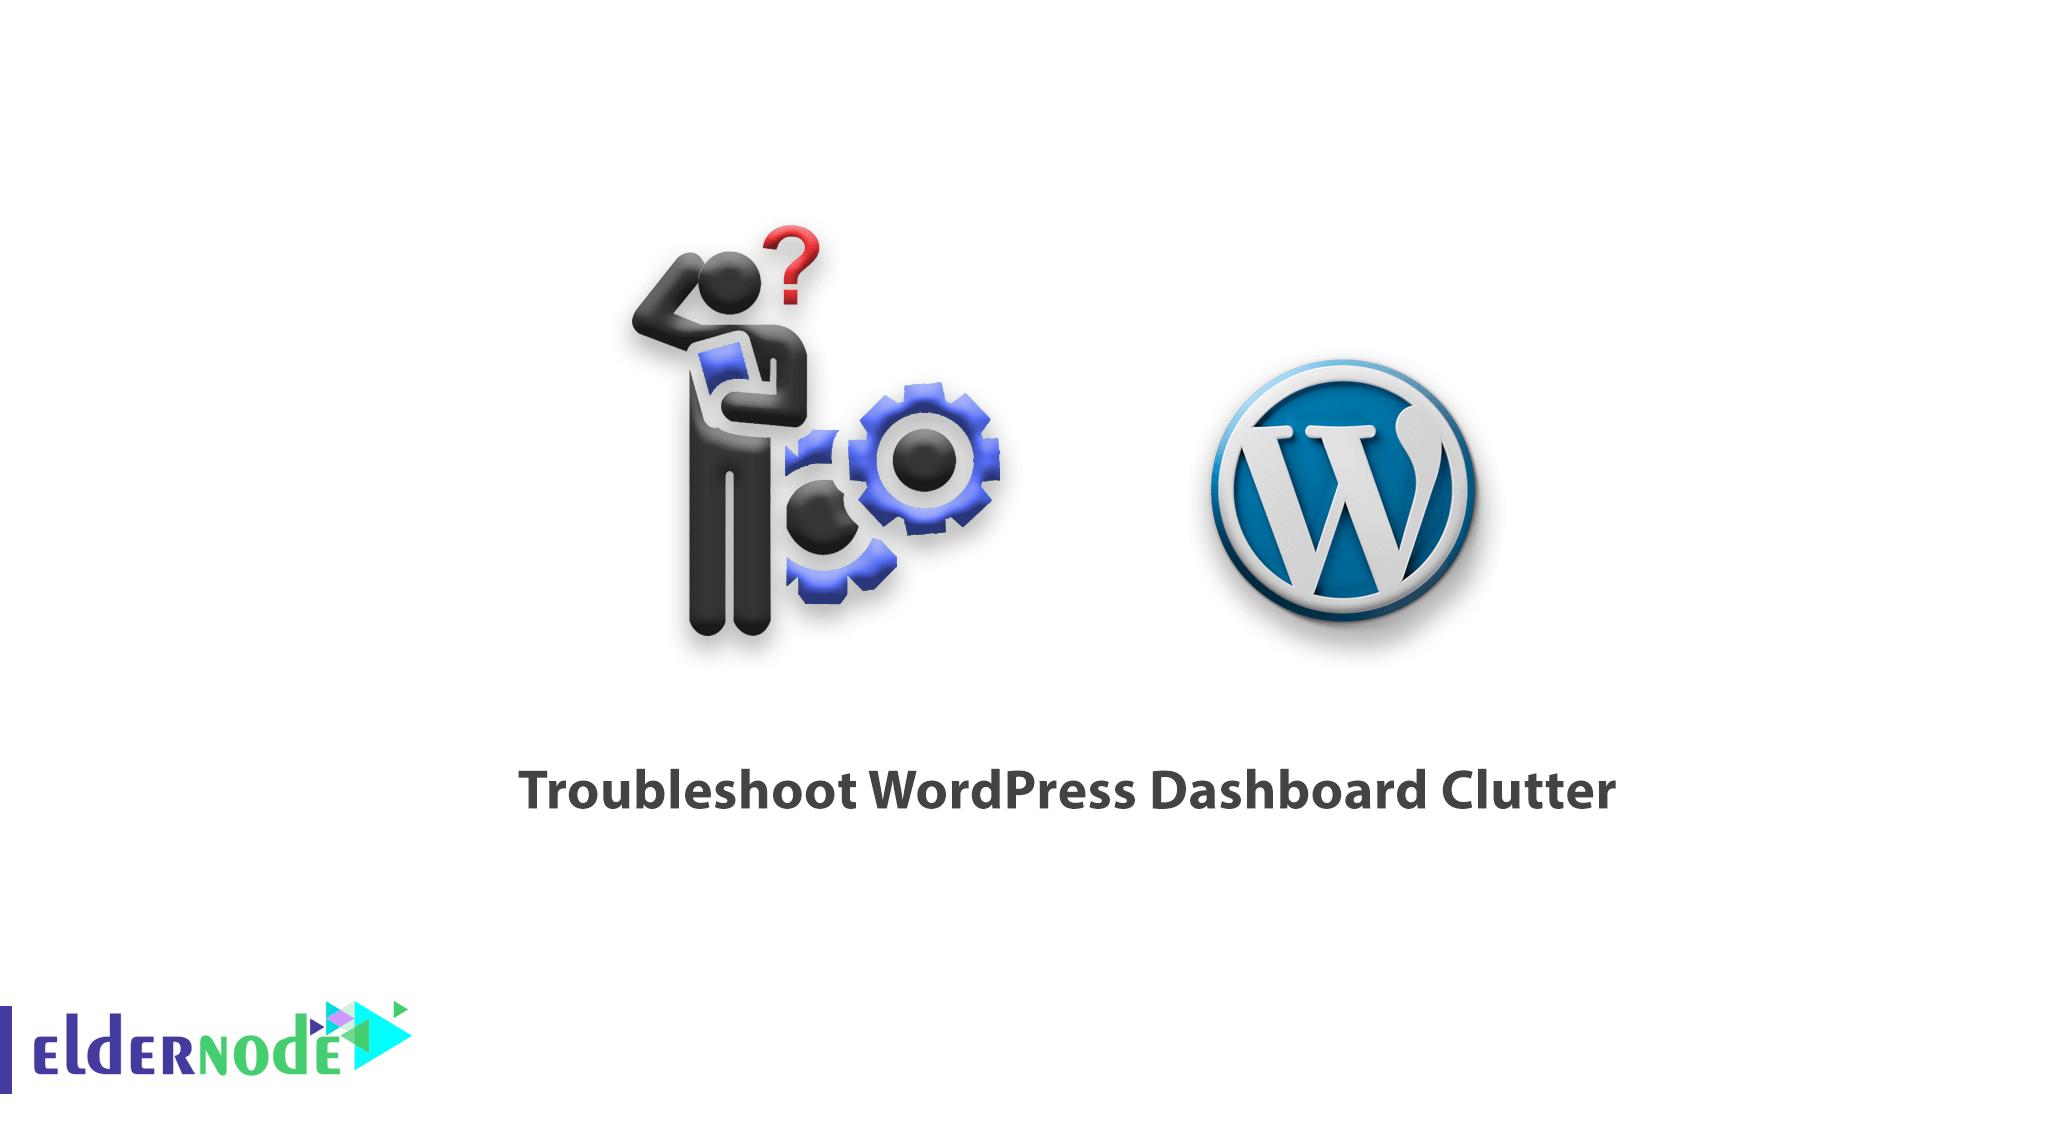 Troubleshoot WordPress Dashboard Clutter